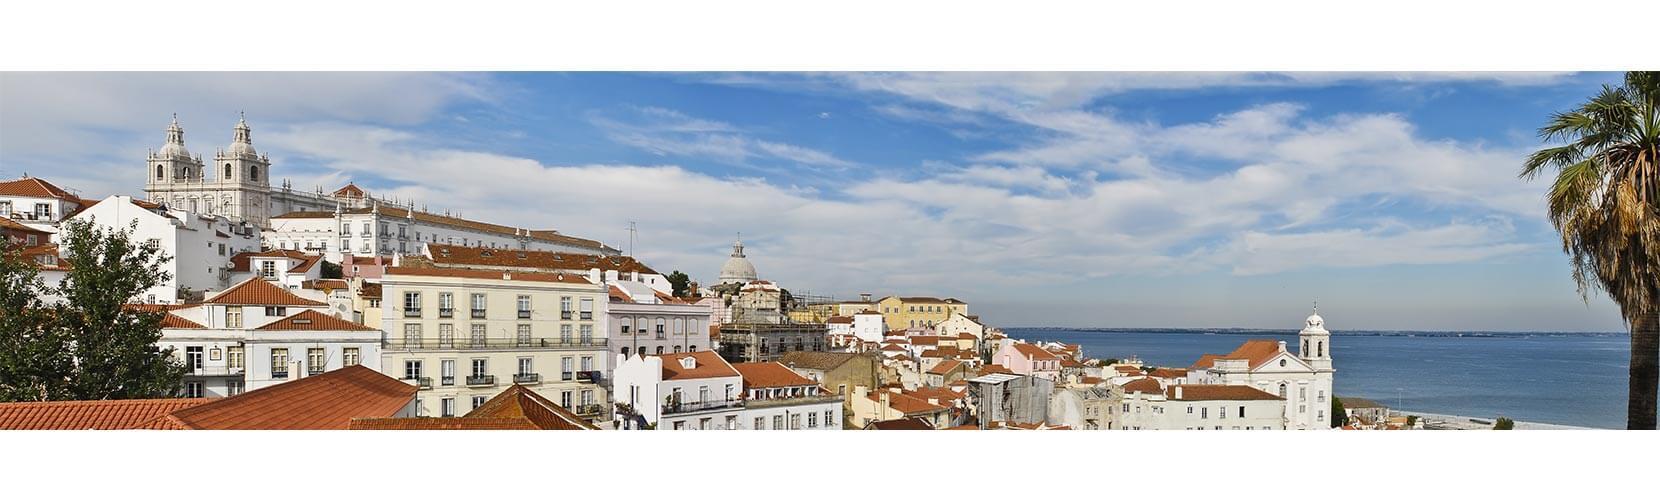 Lisboa apartamentos baratos